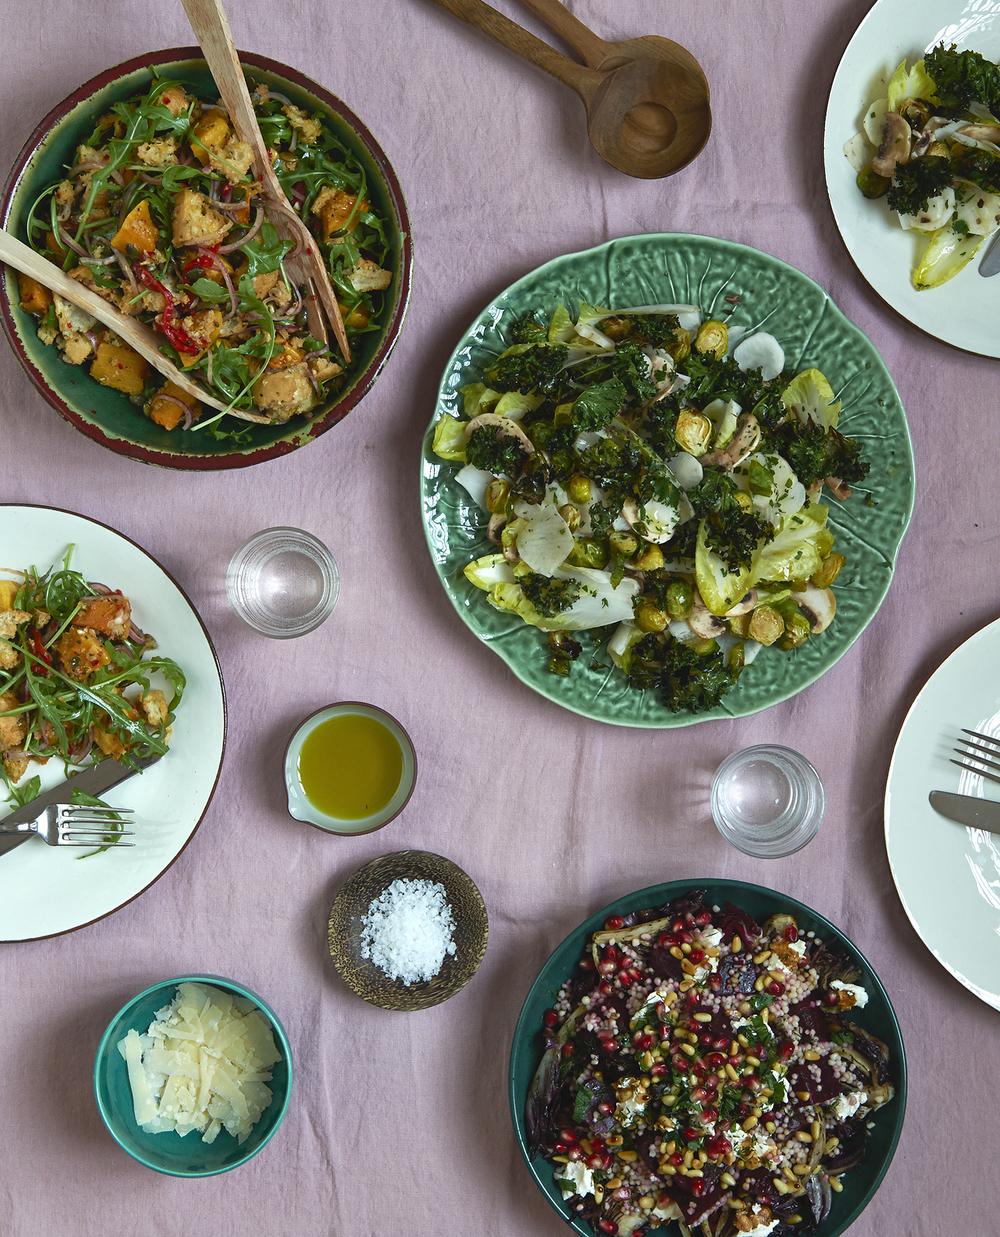 oliver_rowe_guardian_cook_feasting3_henry_14.12.15_web.jpg